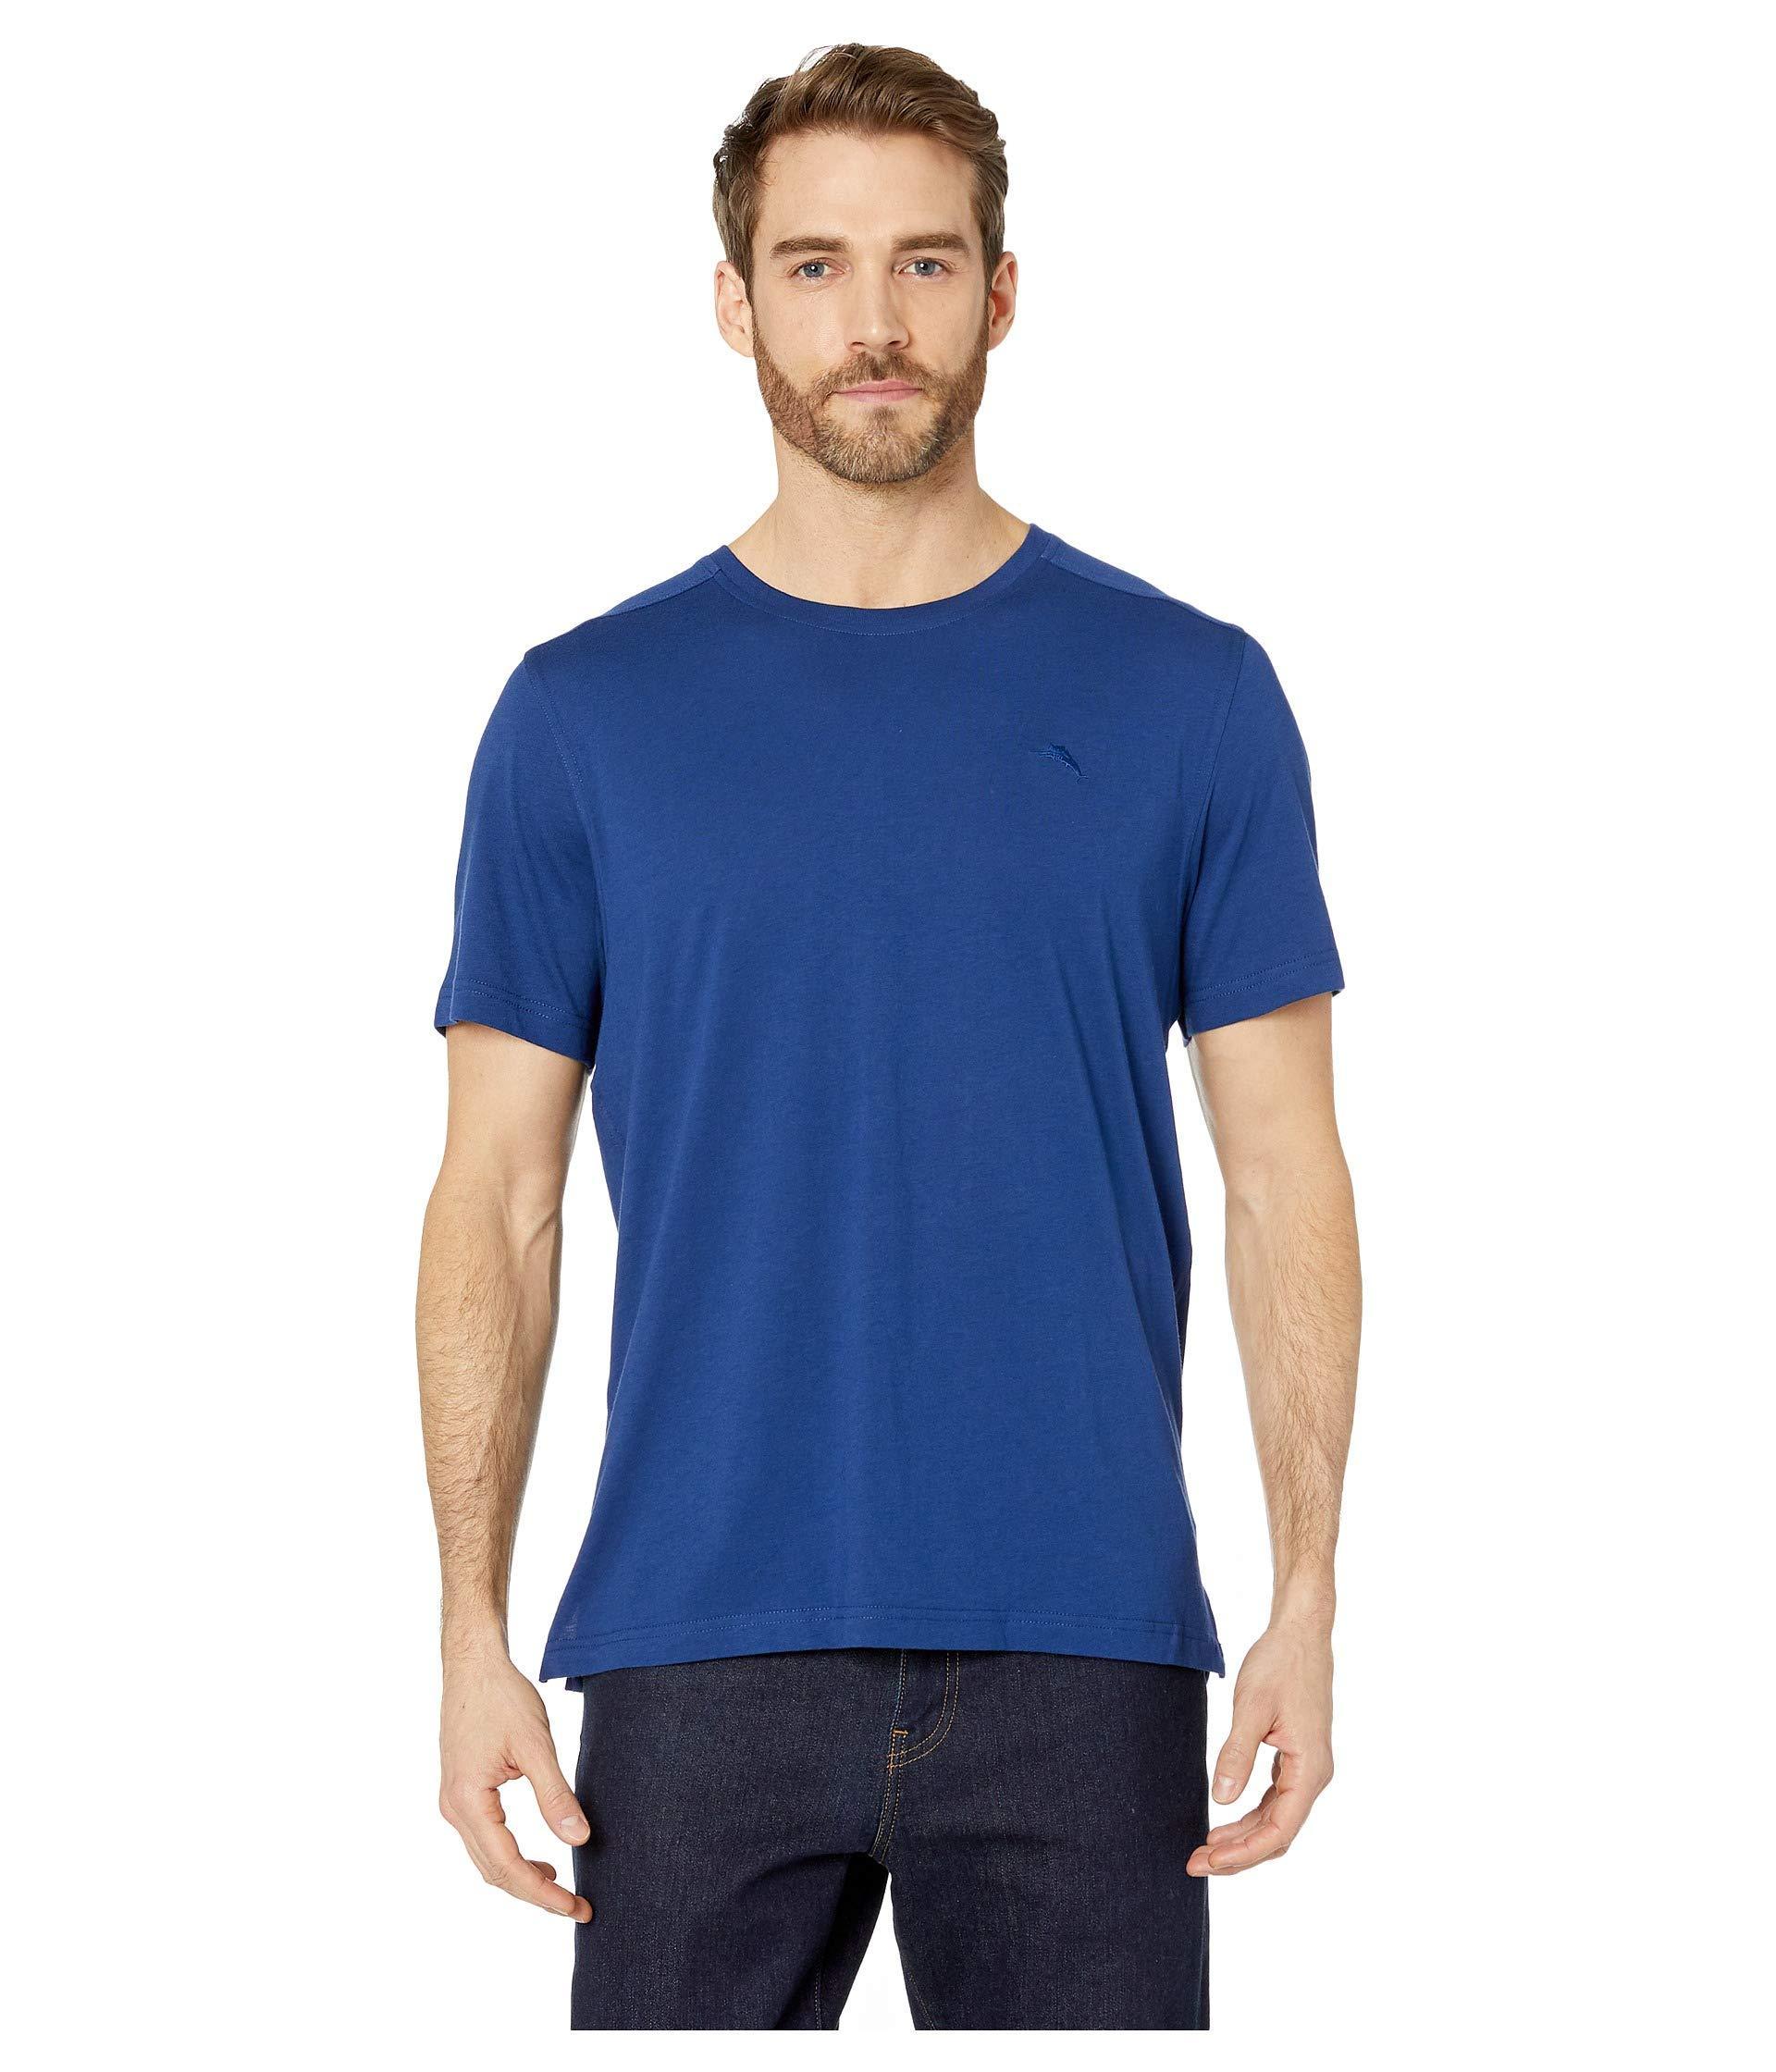 47452591 Lyst - Tommy Bahama Cotton Modal Knit Jersey T-shirt (heather Grey ...